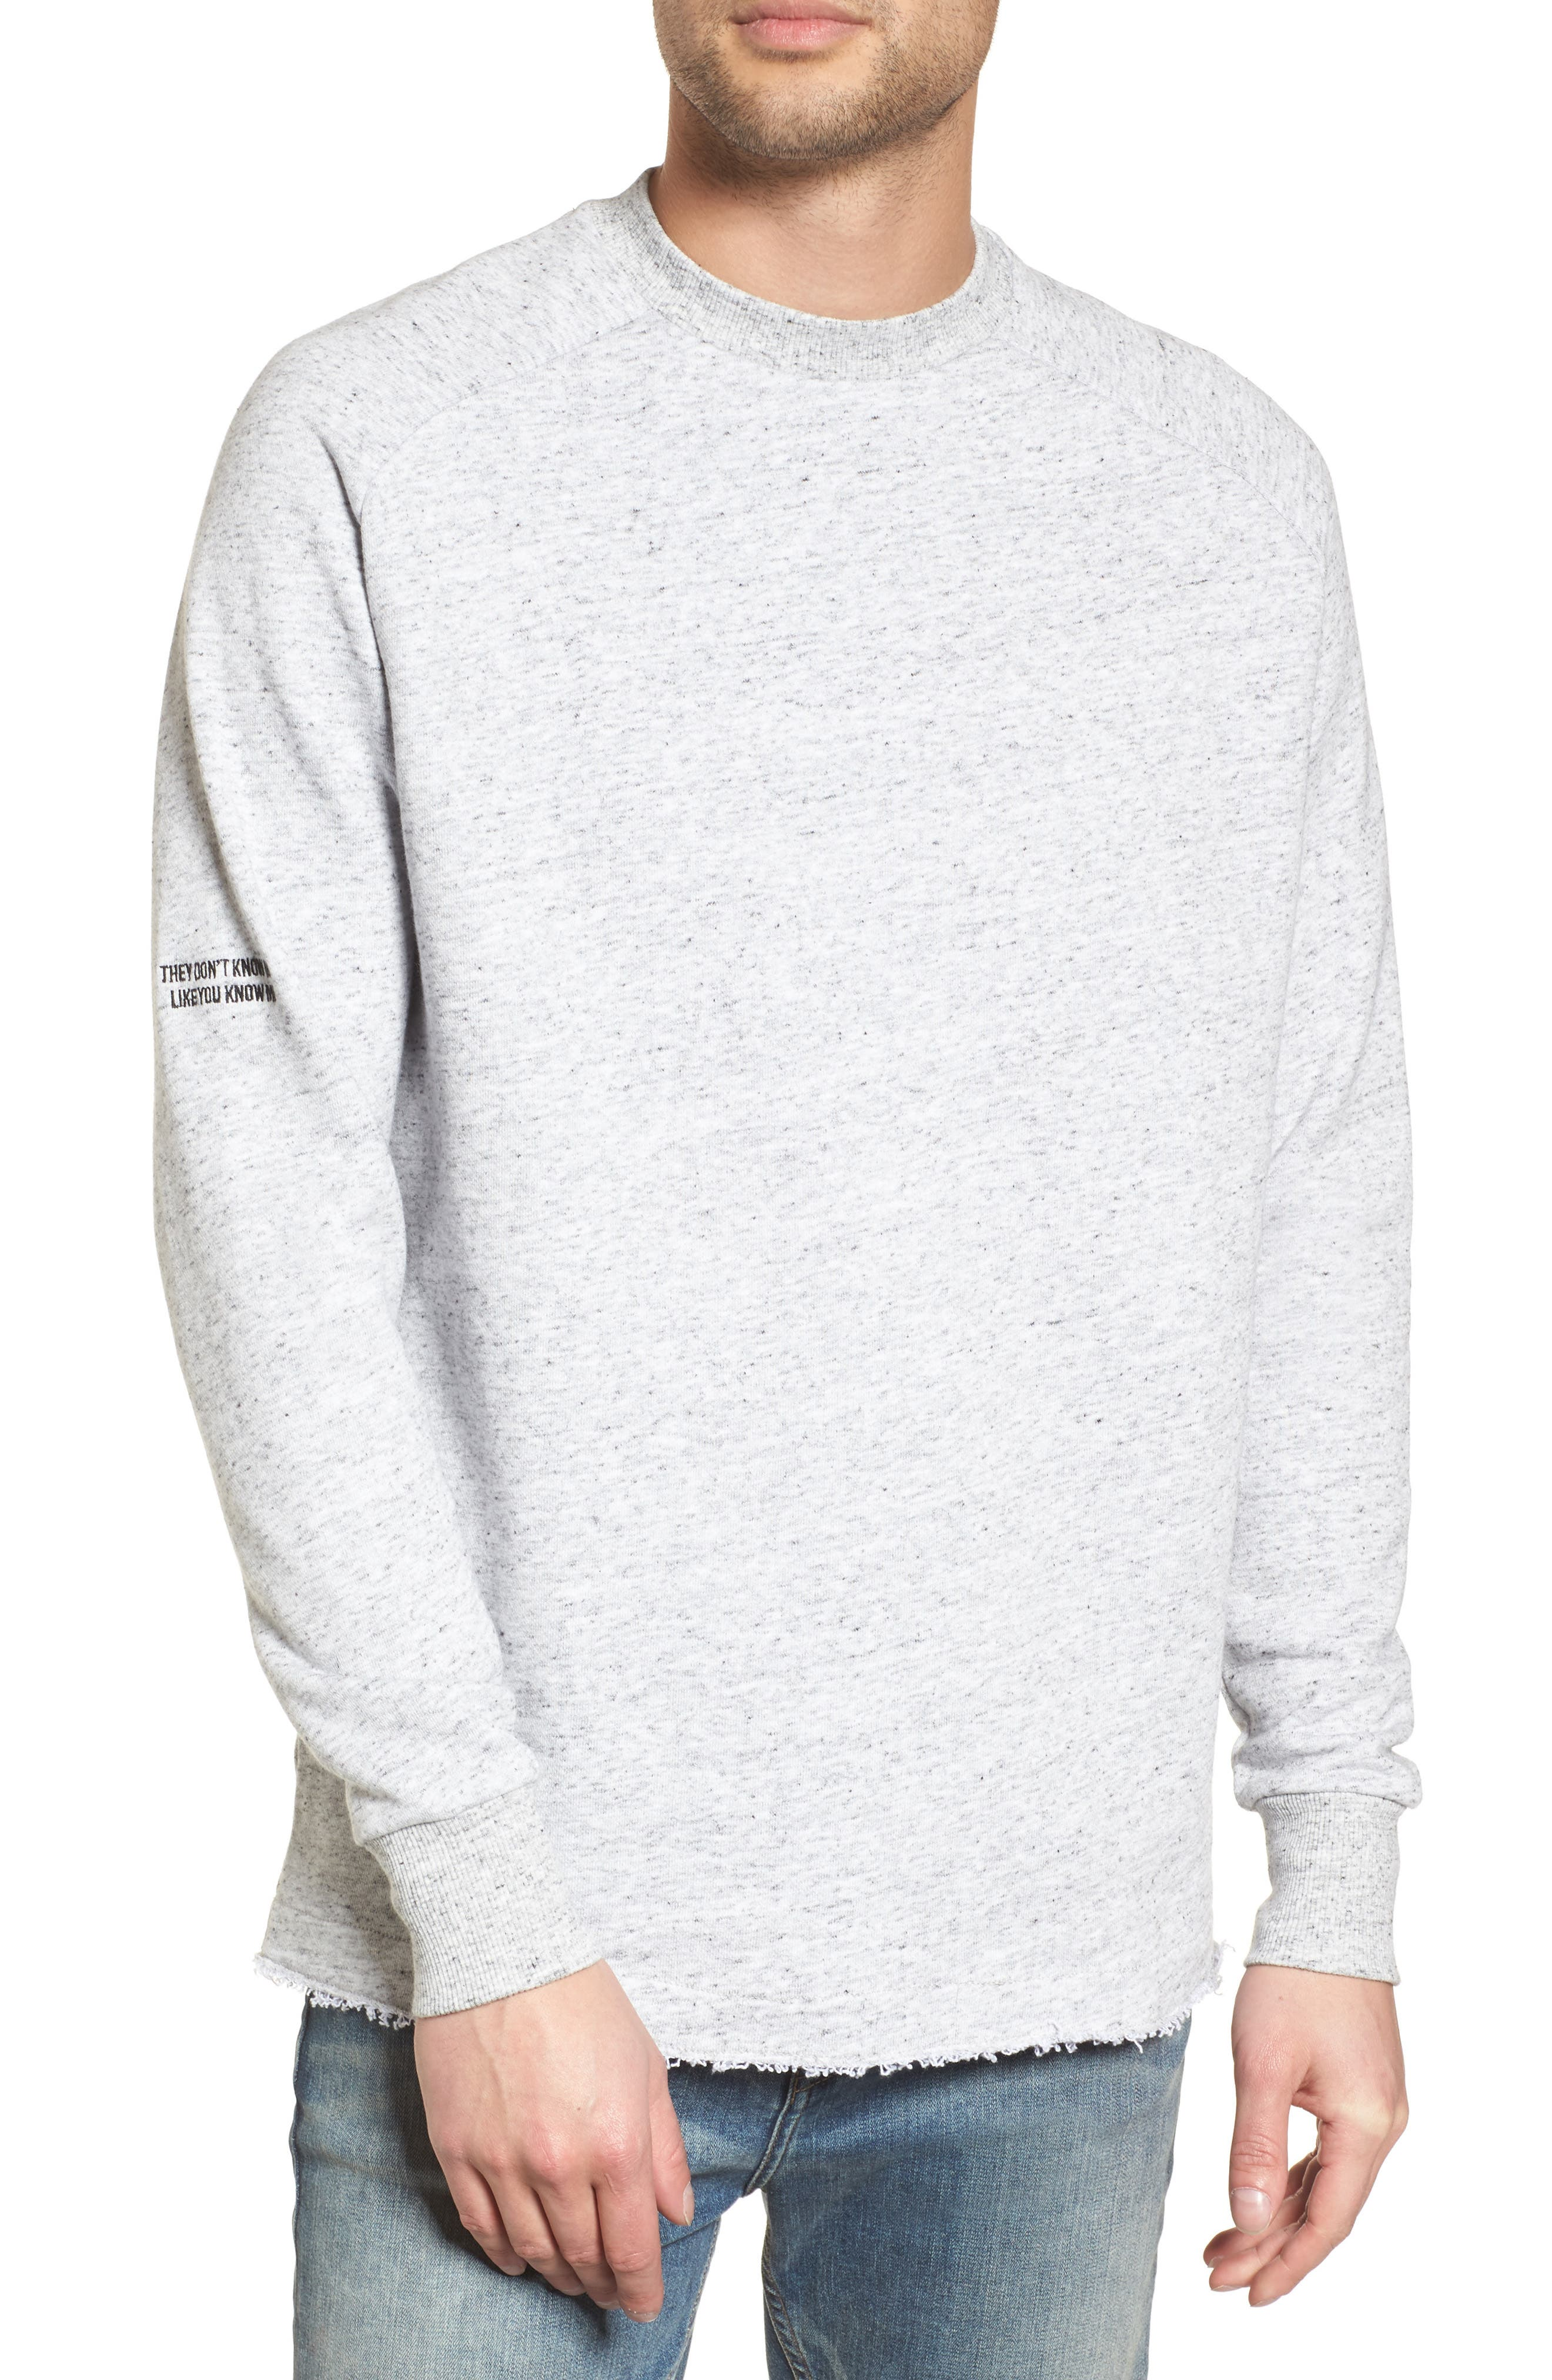 Torn Crew Sweatshirt,                             Main thumbnail 1, color,                             059